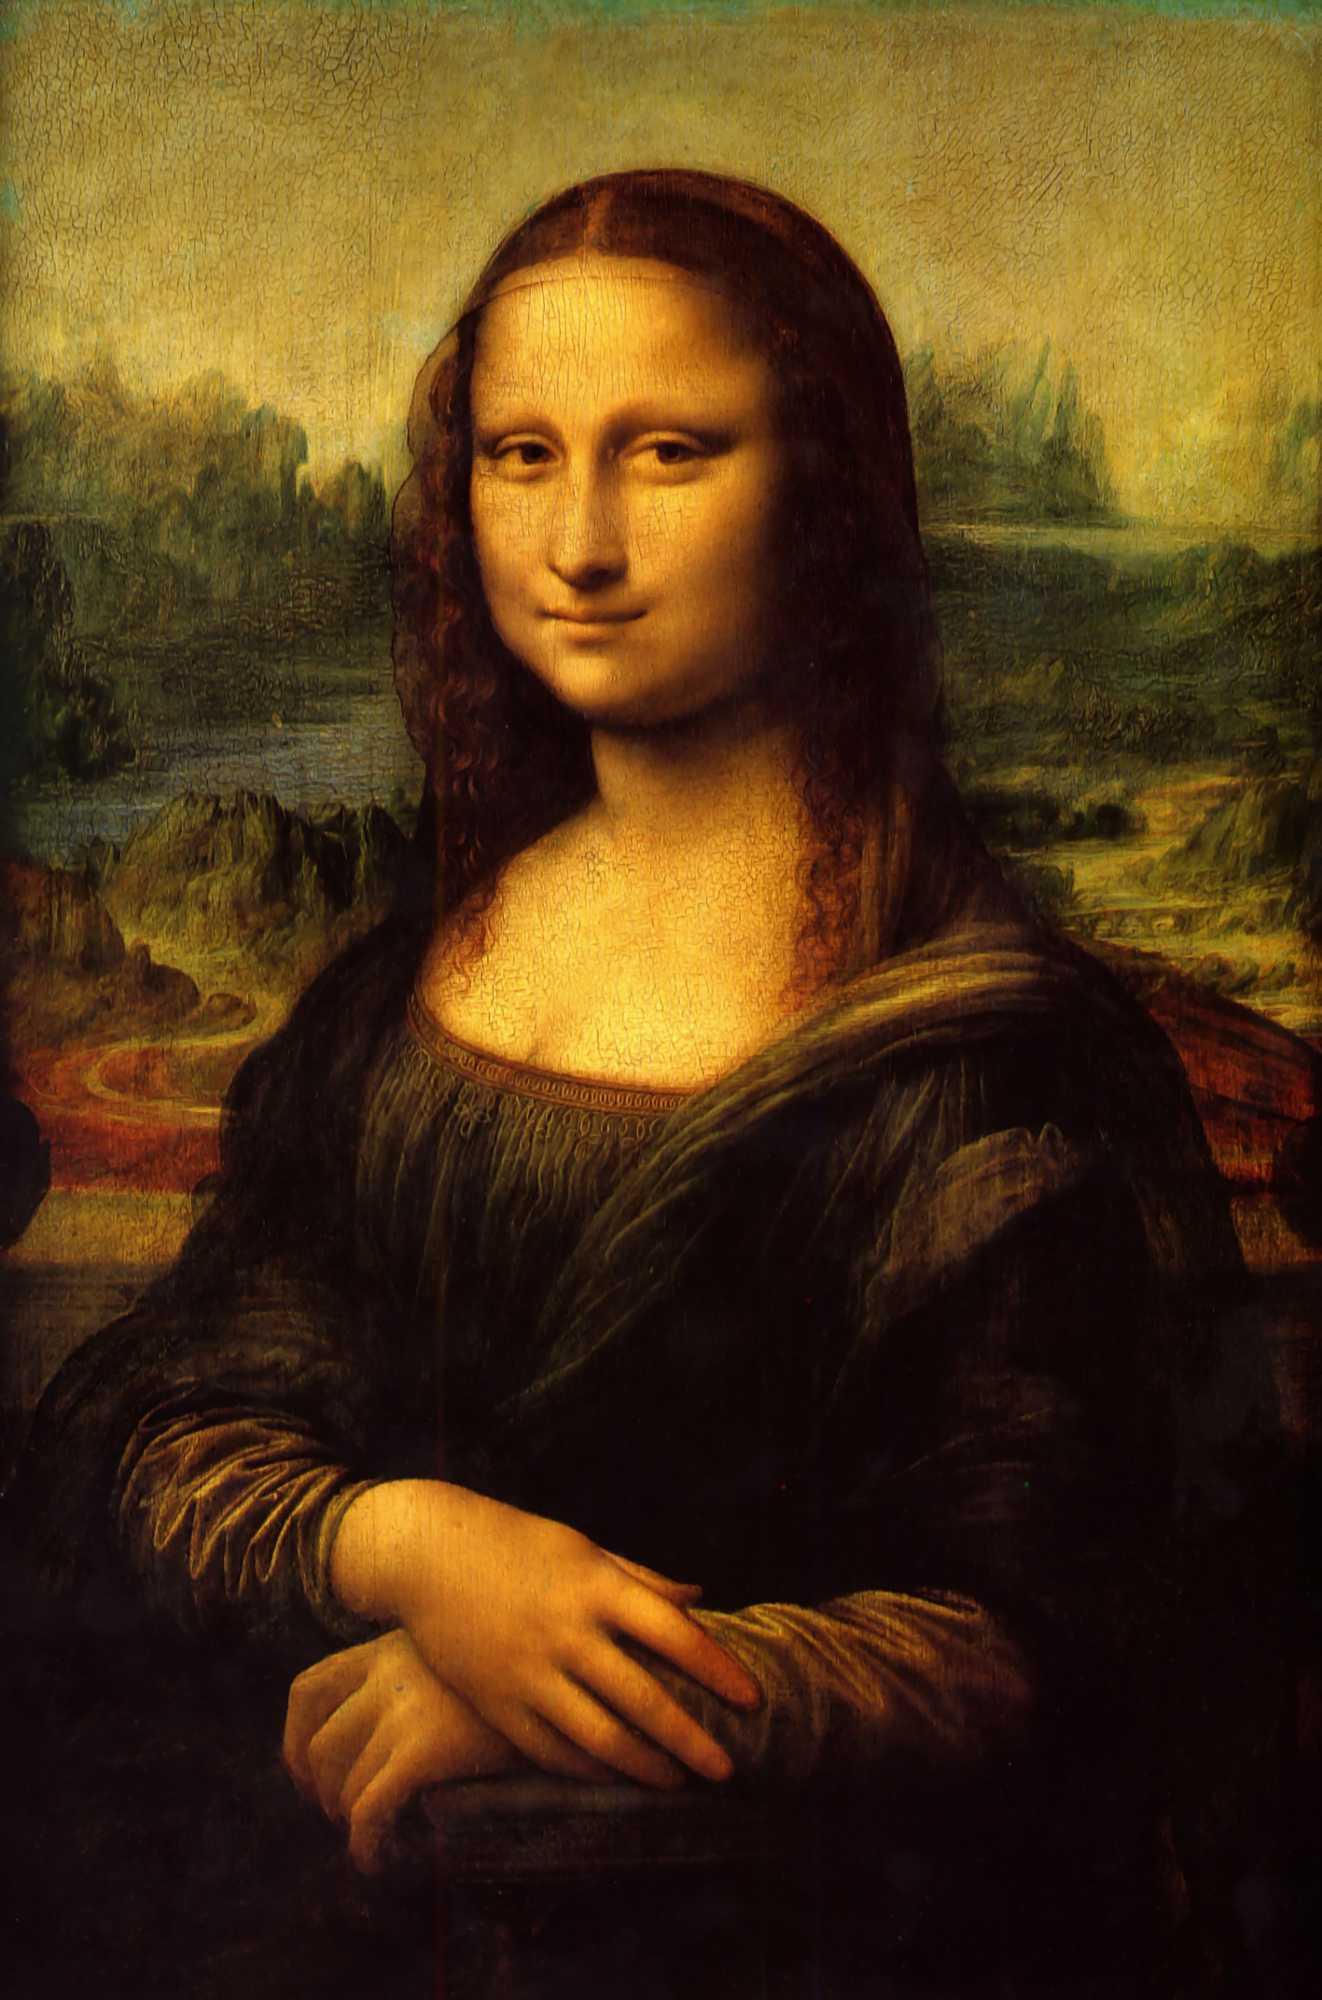 Renaissance clipart mona lisa #13